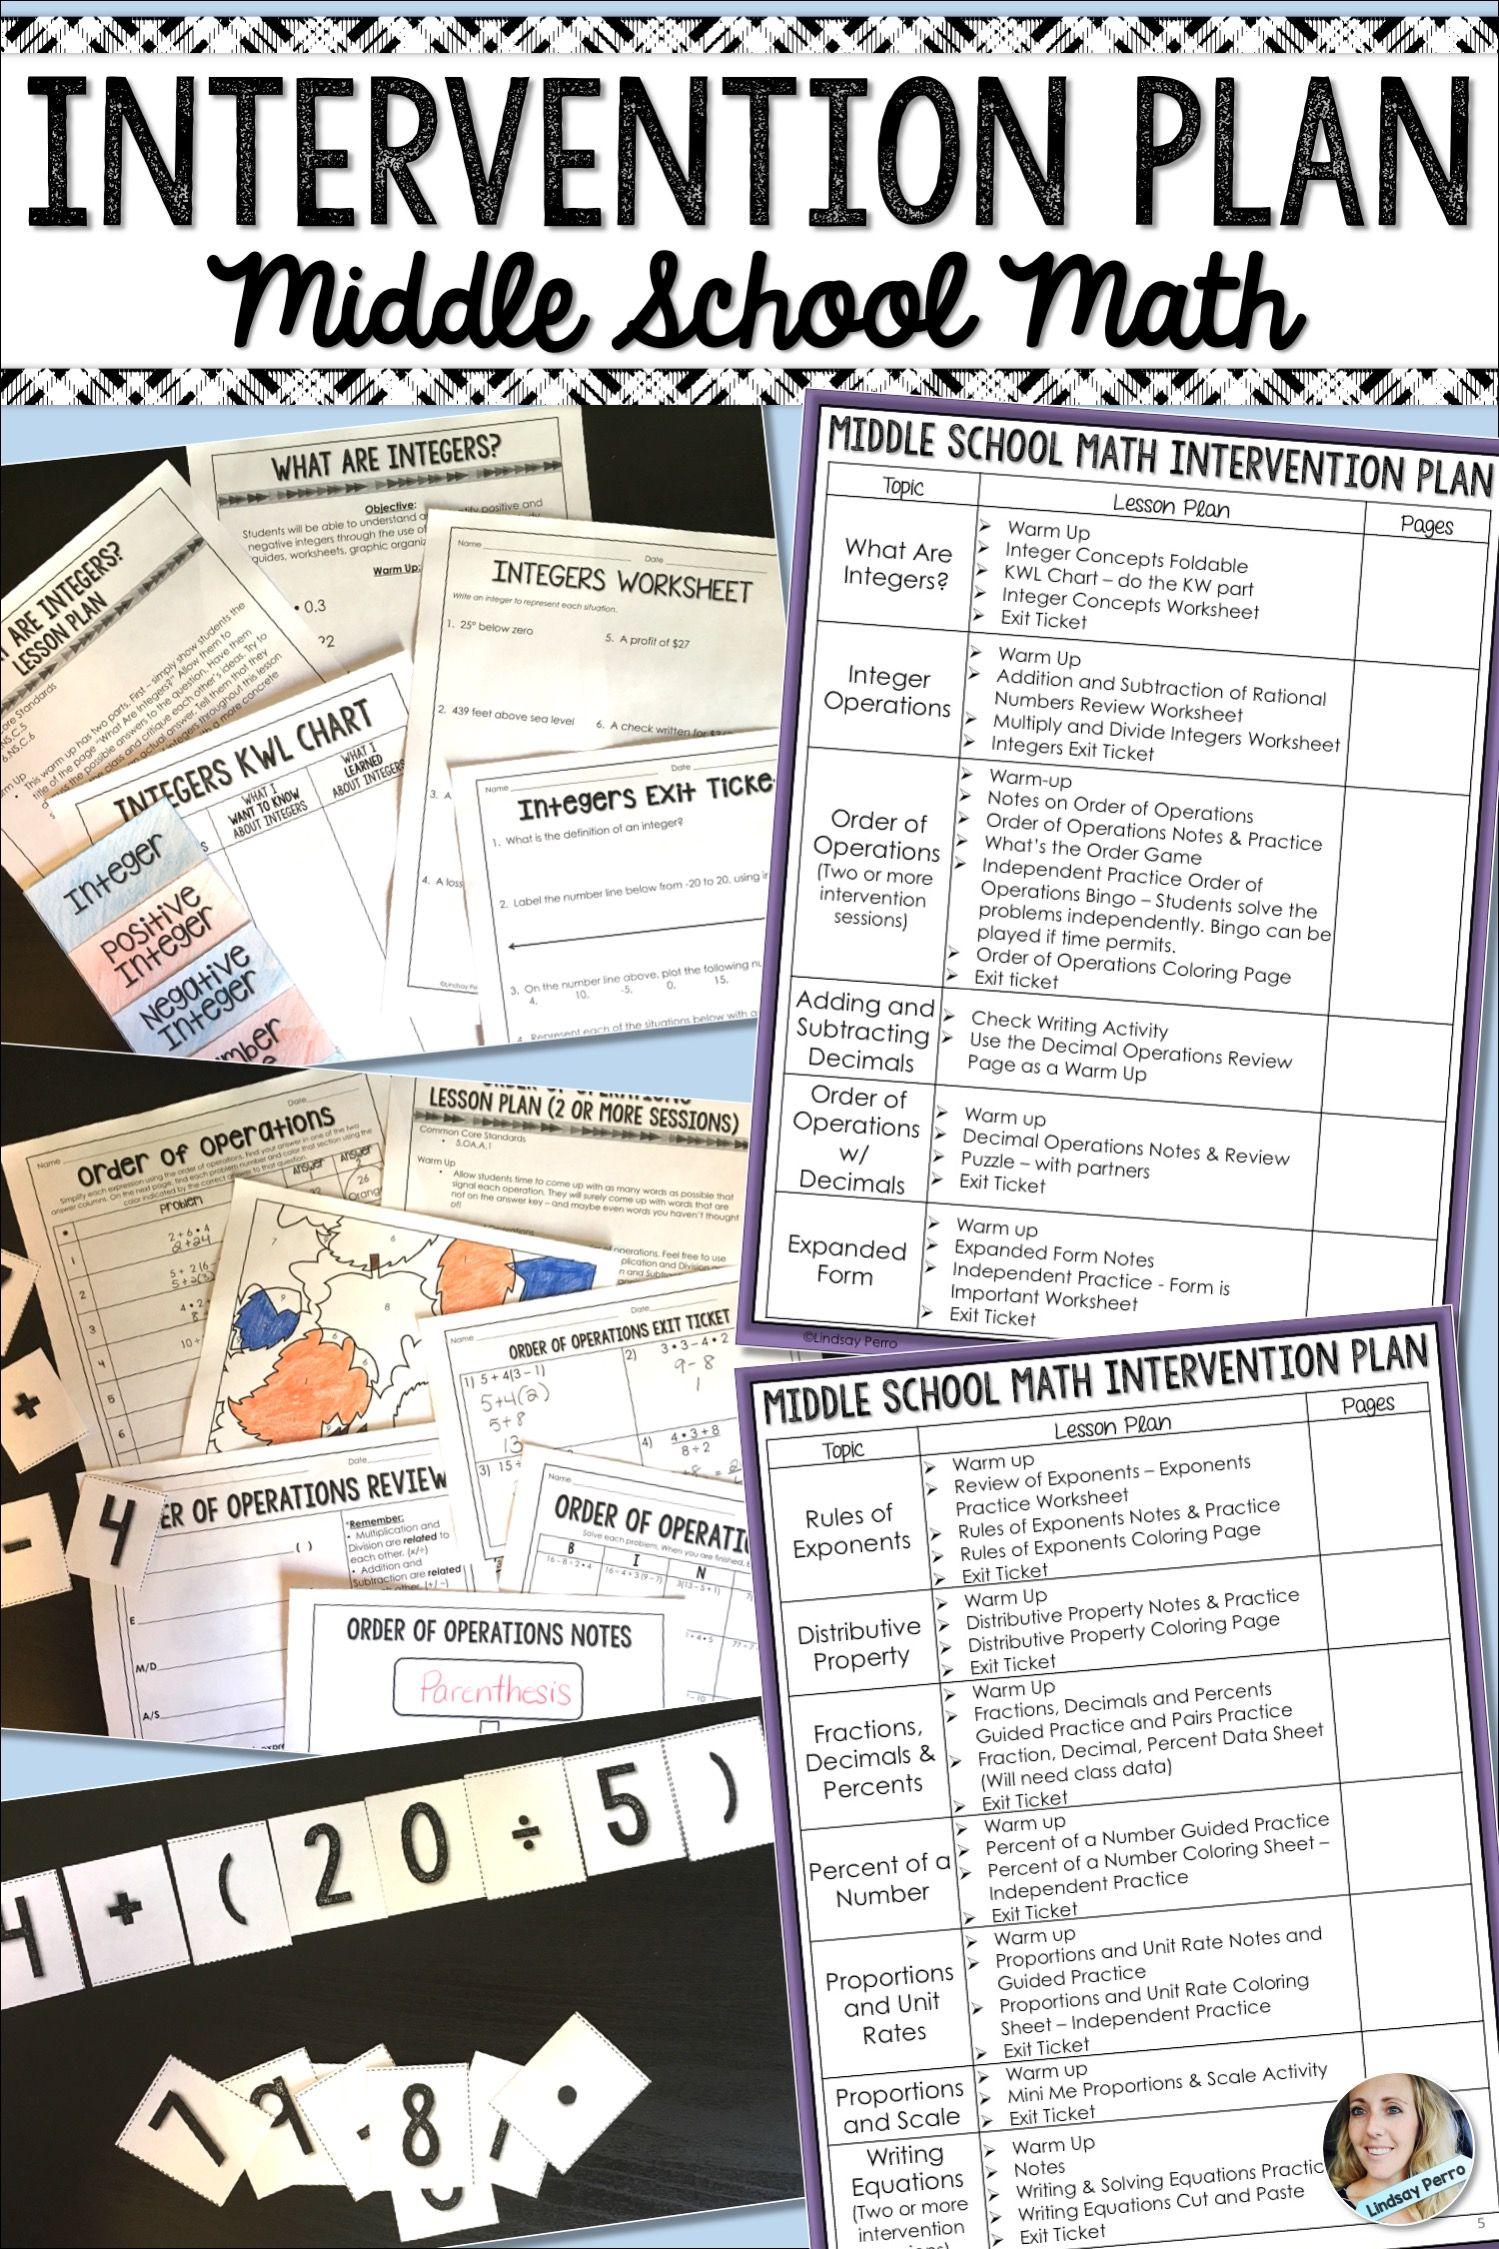 Math Intervention Plan Middle School Common Core